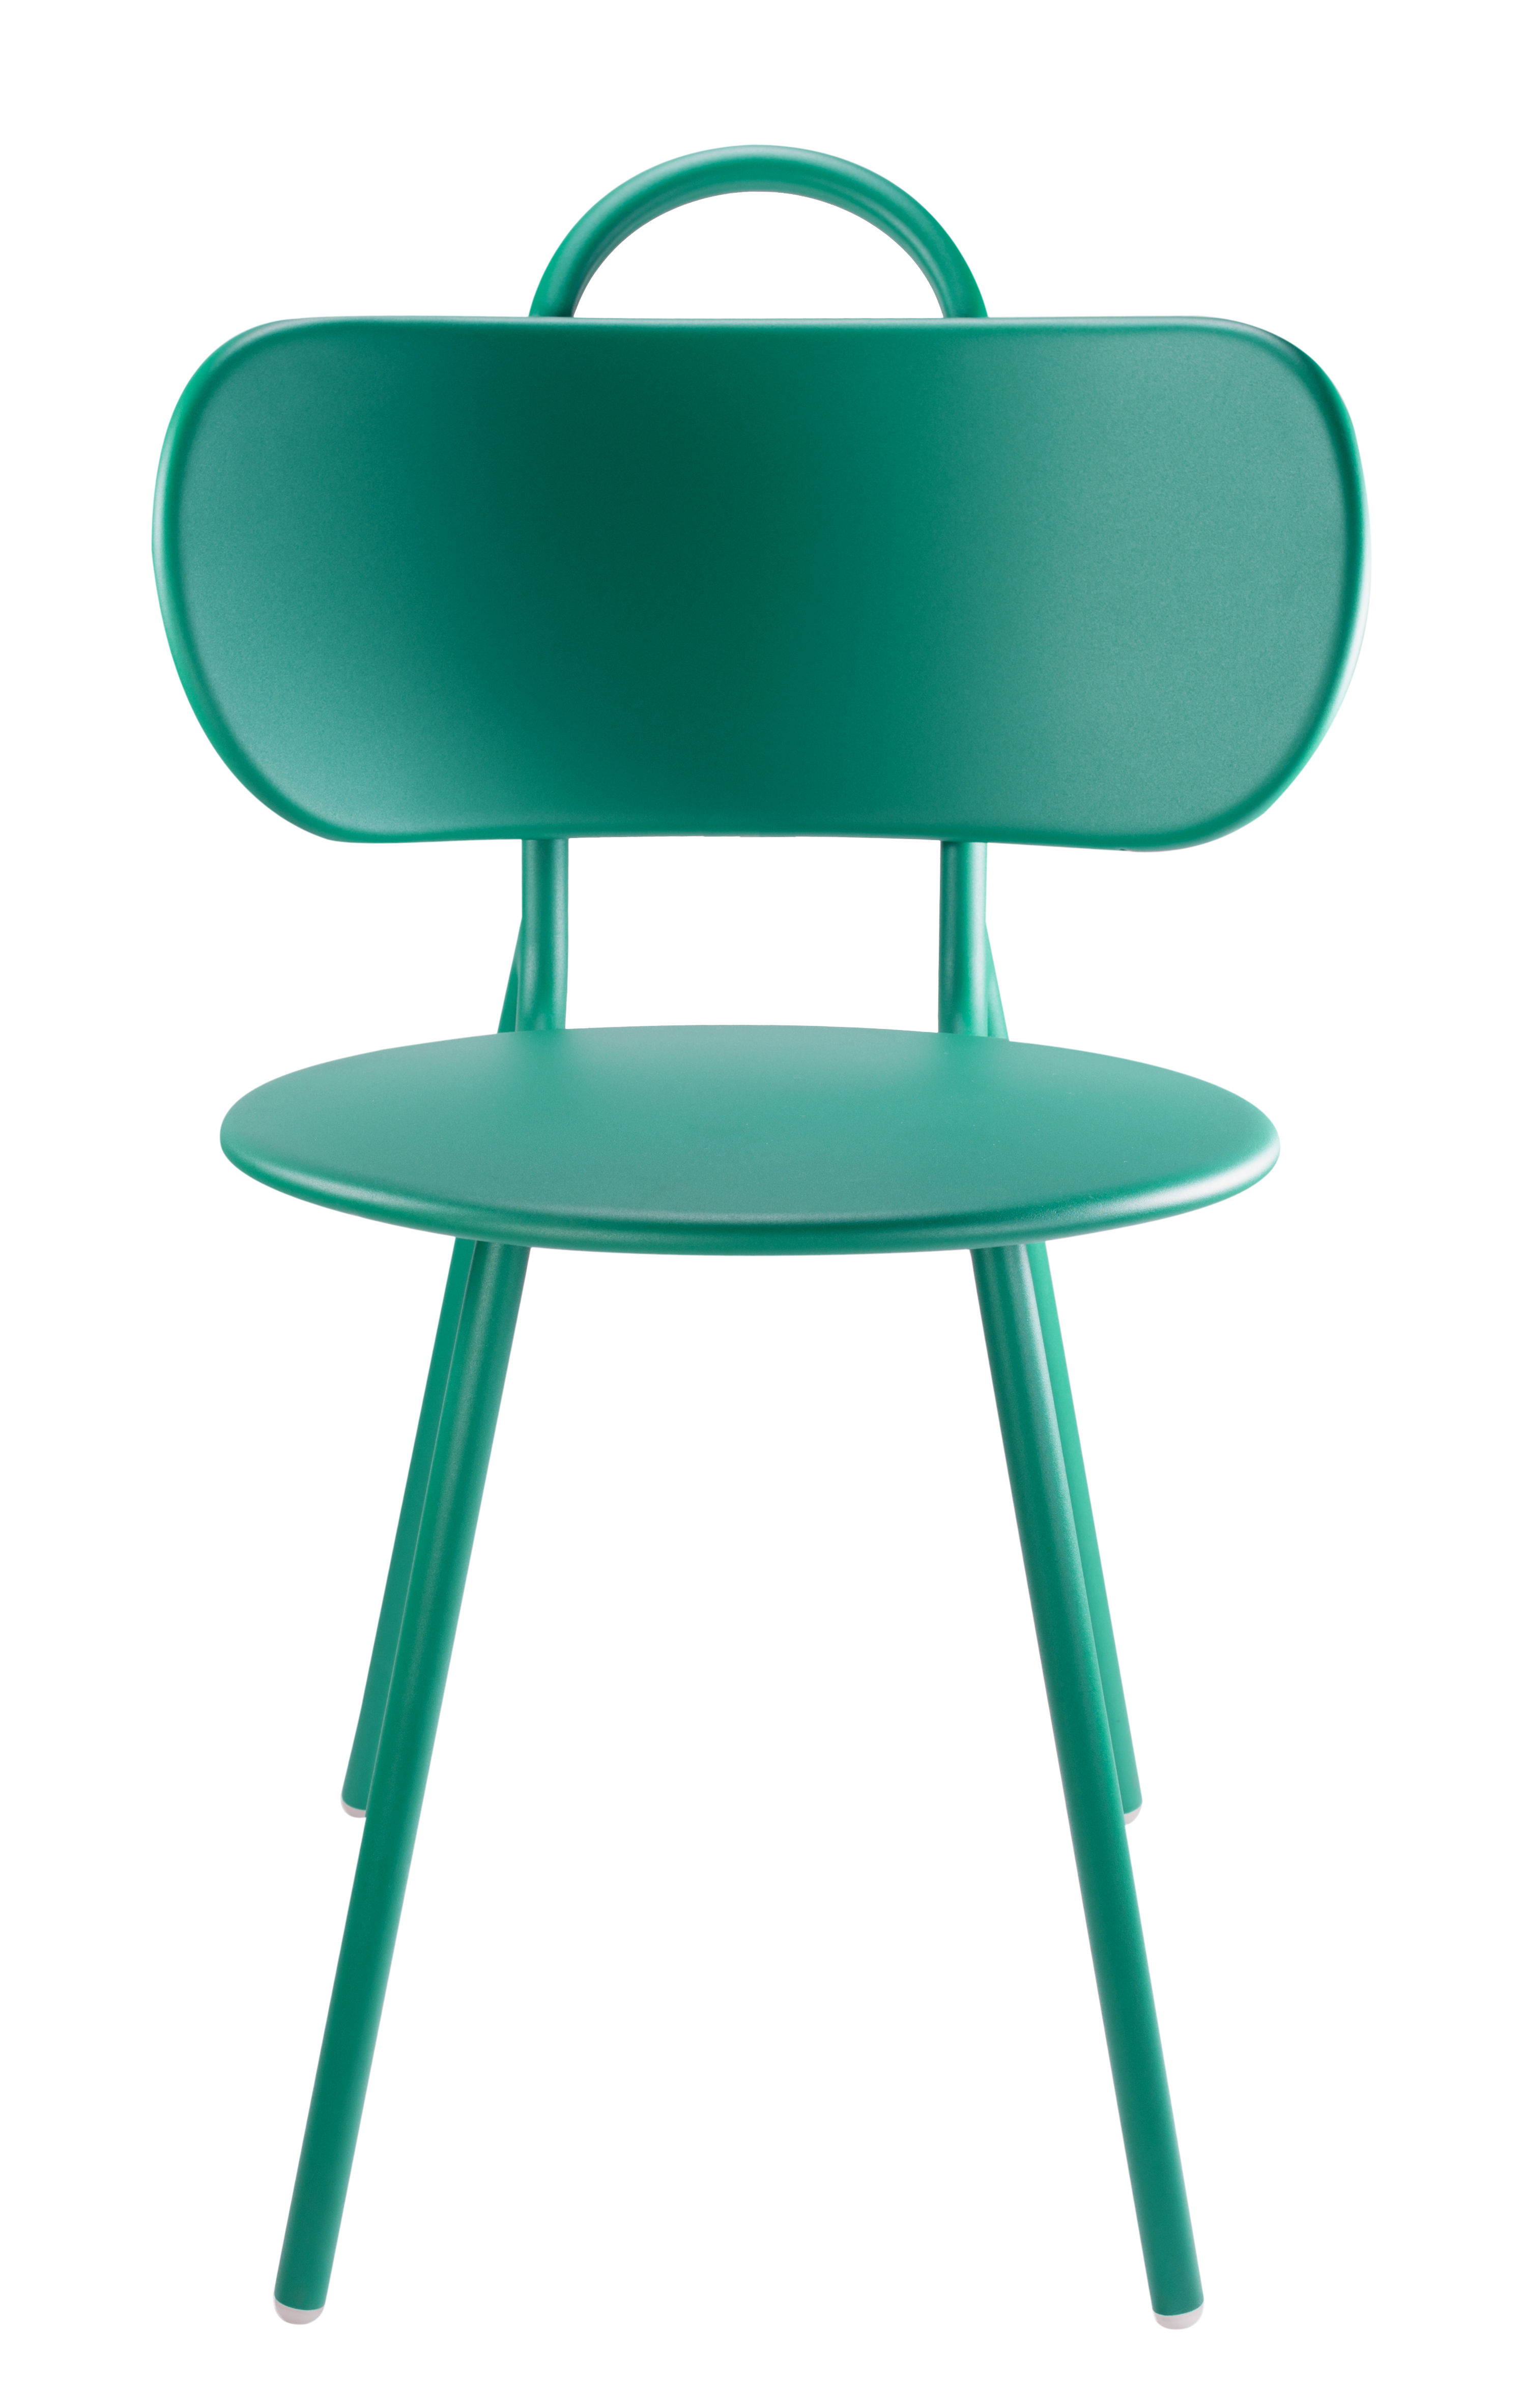 Chaise Swim Bibelo Bleu Turquoise L 46 X H 81 5 Made In Design